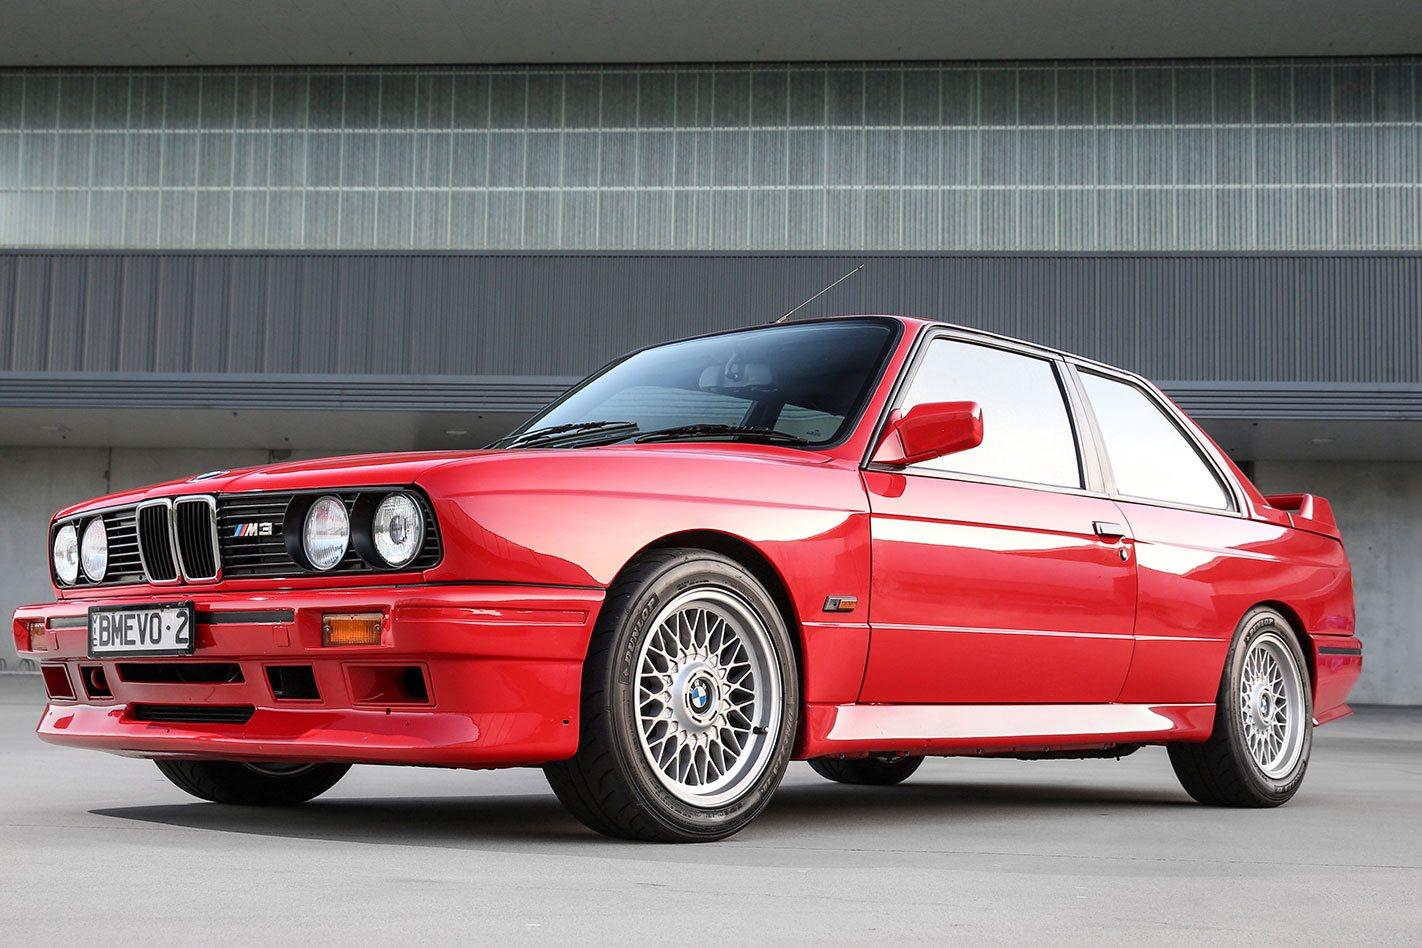 BMW-M3-E30-Evolution-II-side-profile.jpg